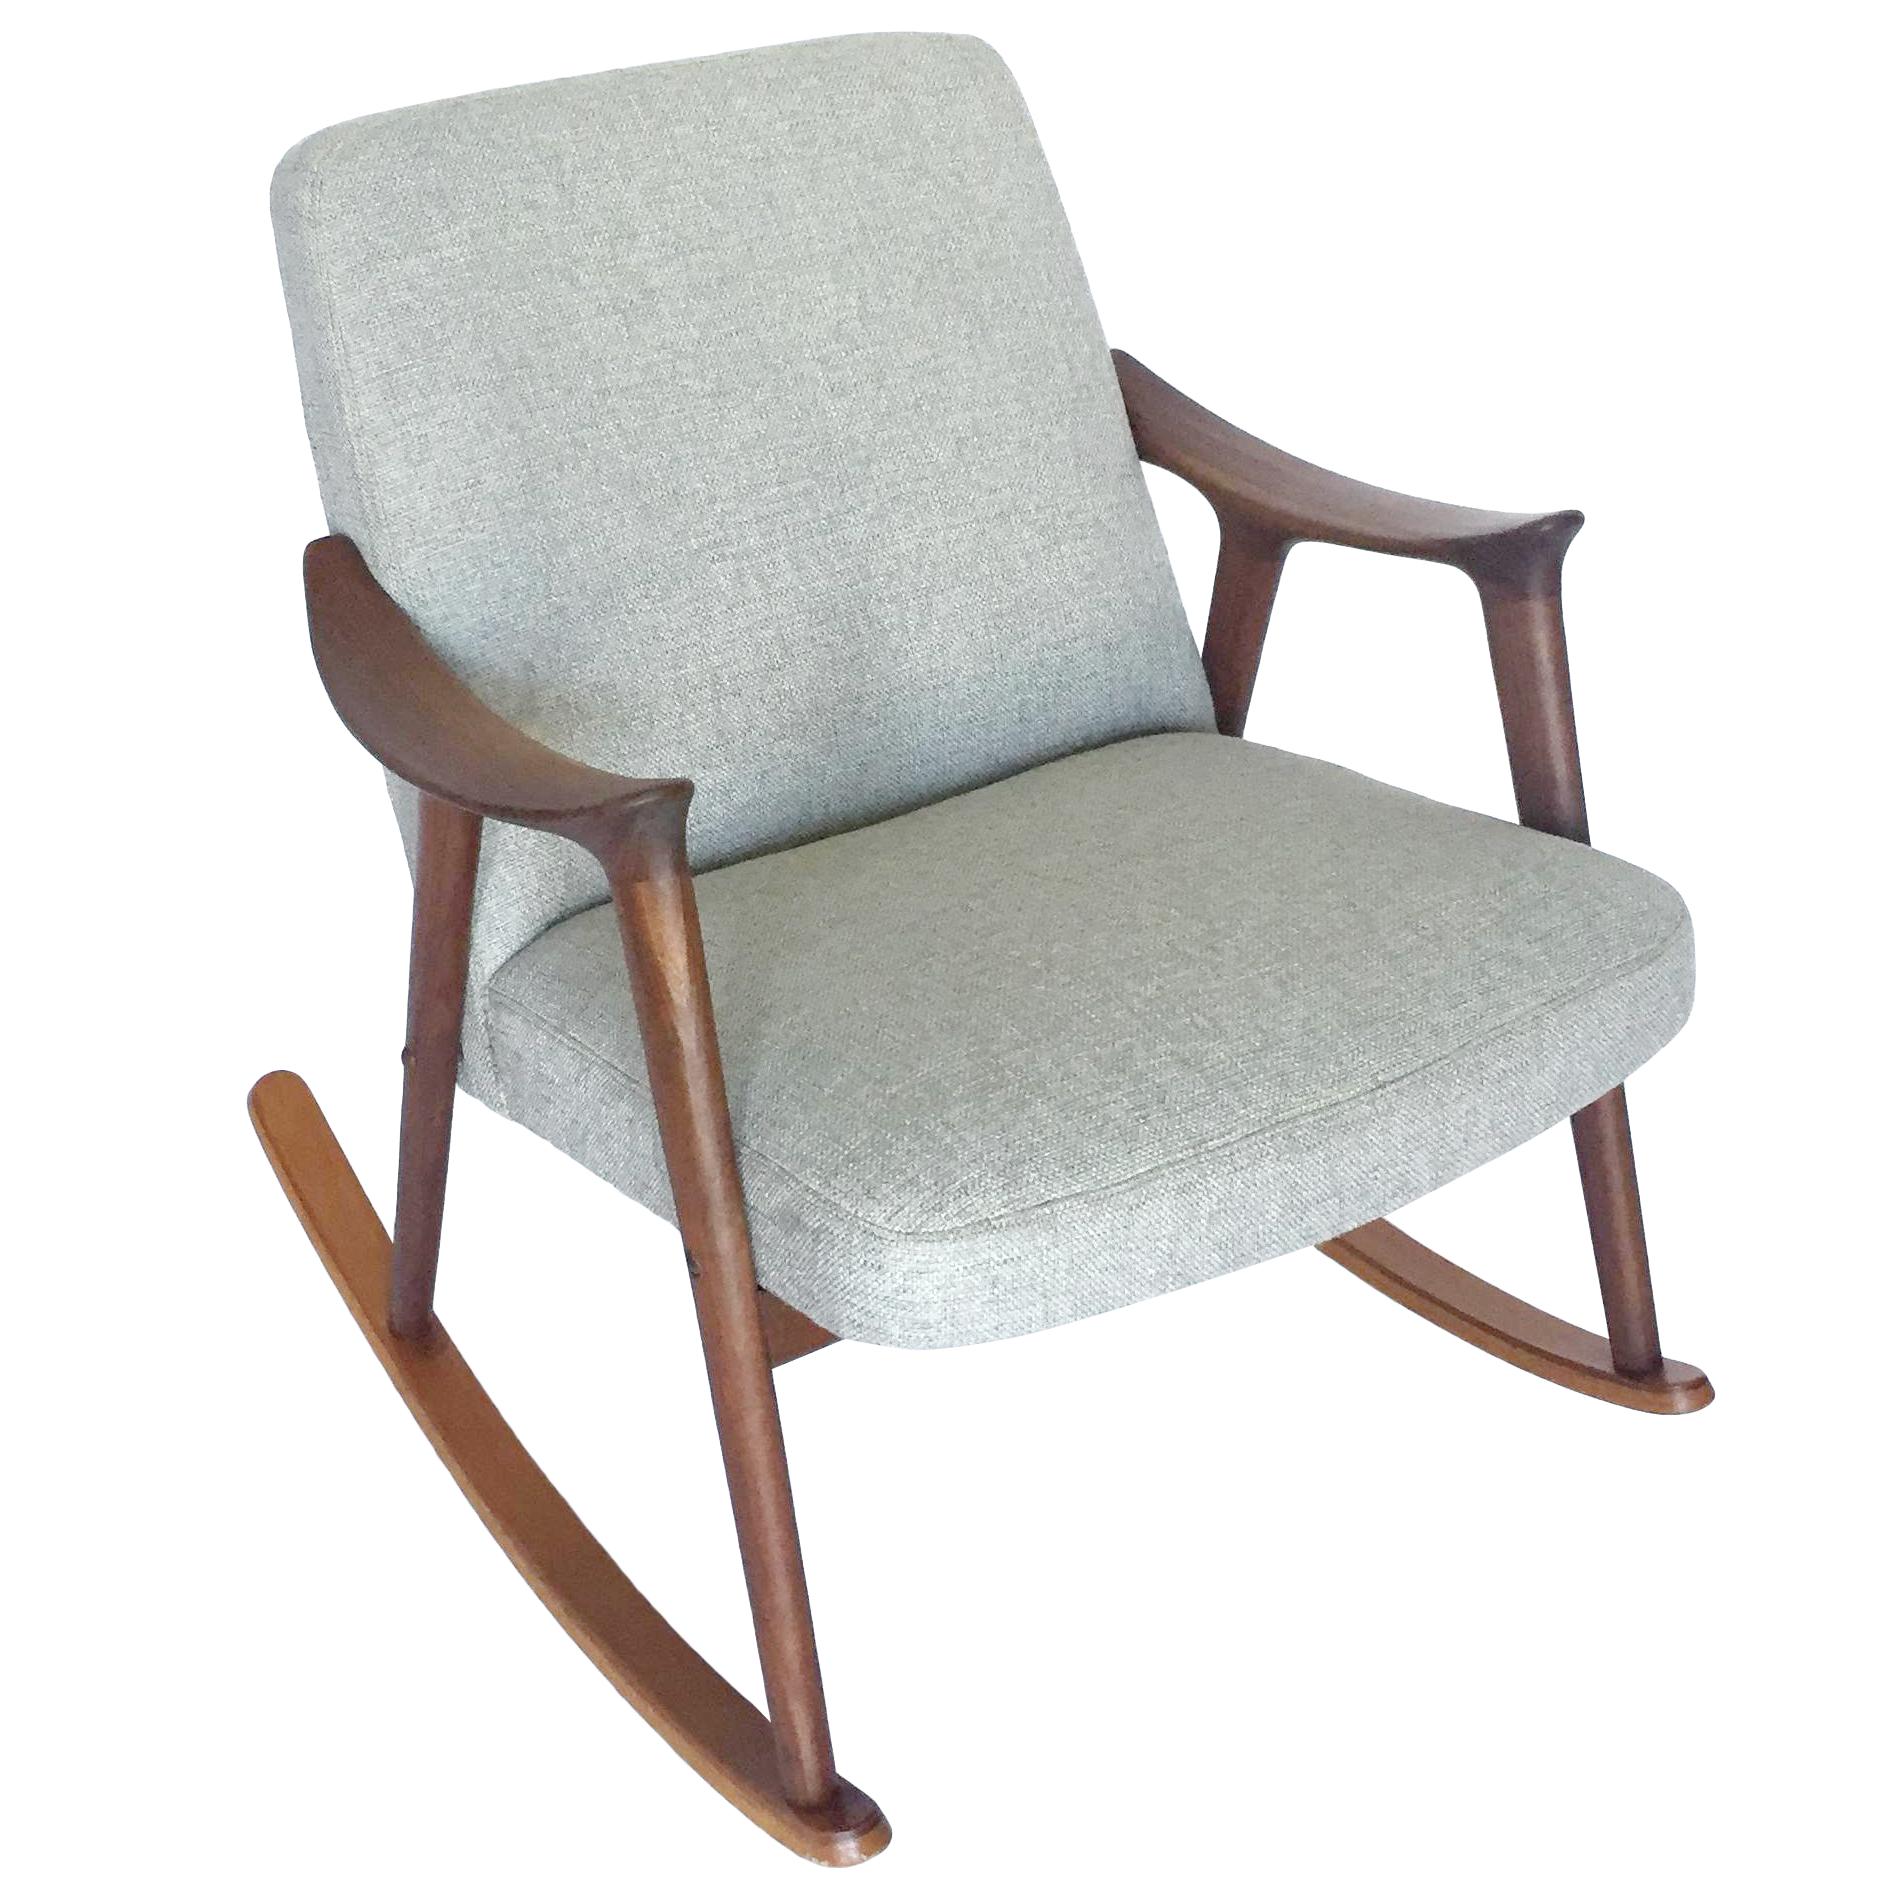 fabric upholstered century waldmann mid rocking modern grey studio chair baxton